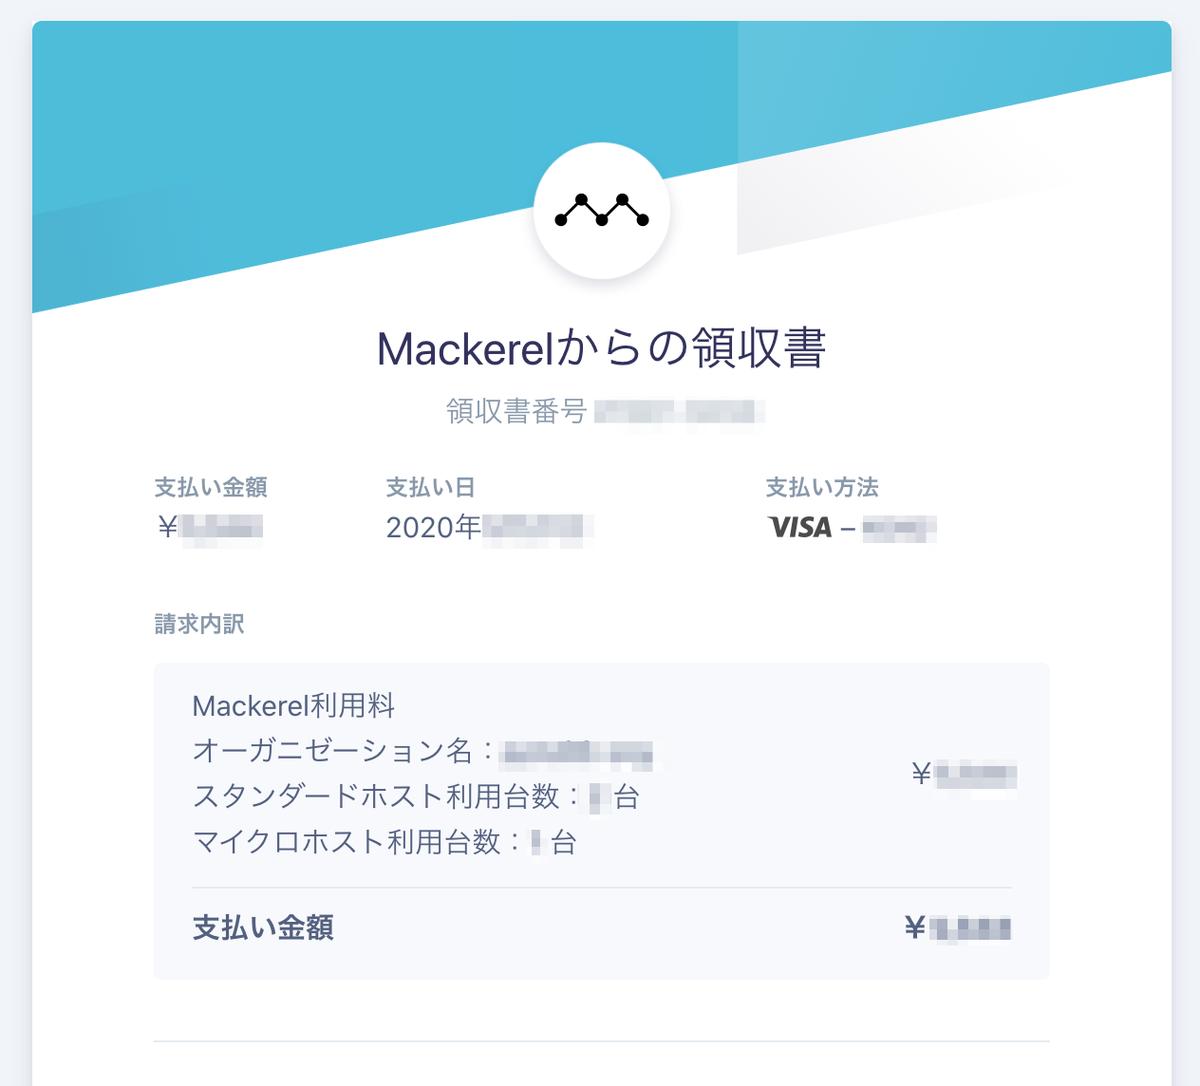 f:id:mackerelio:20200626114953p:plain